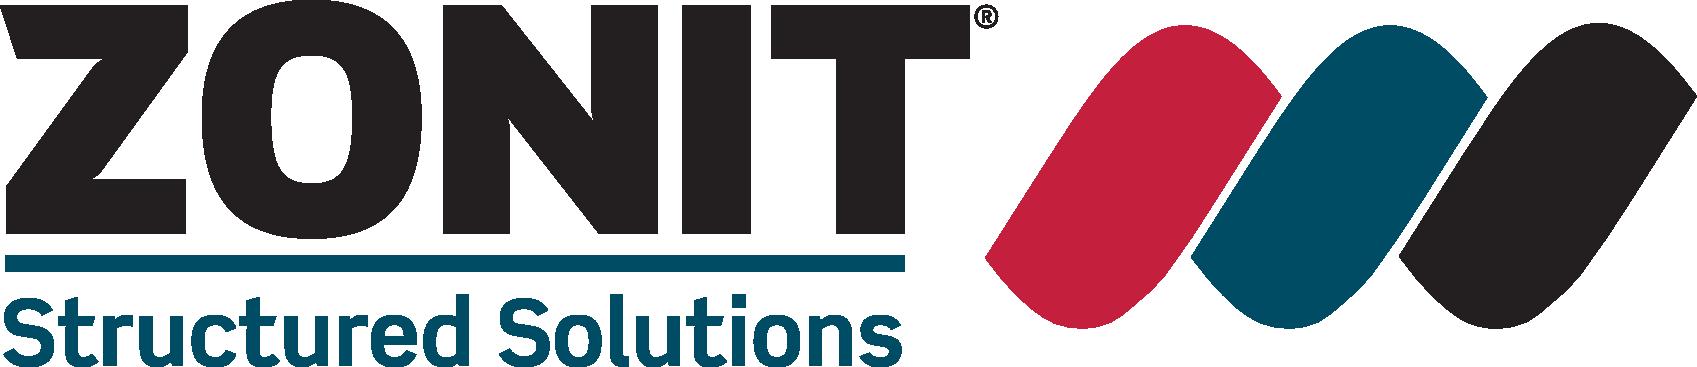 Zonit logo